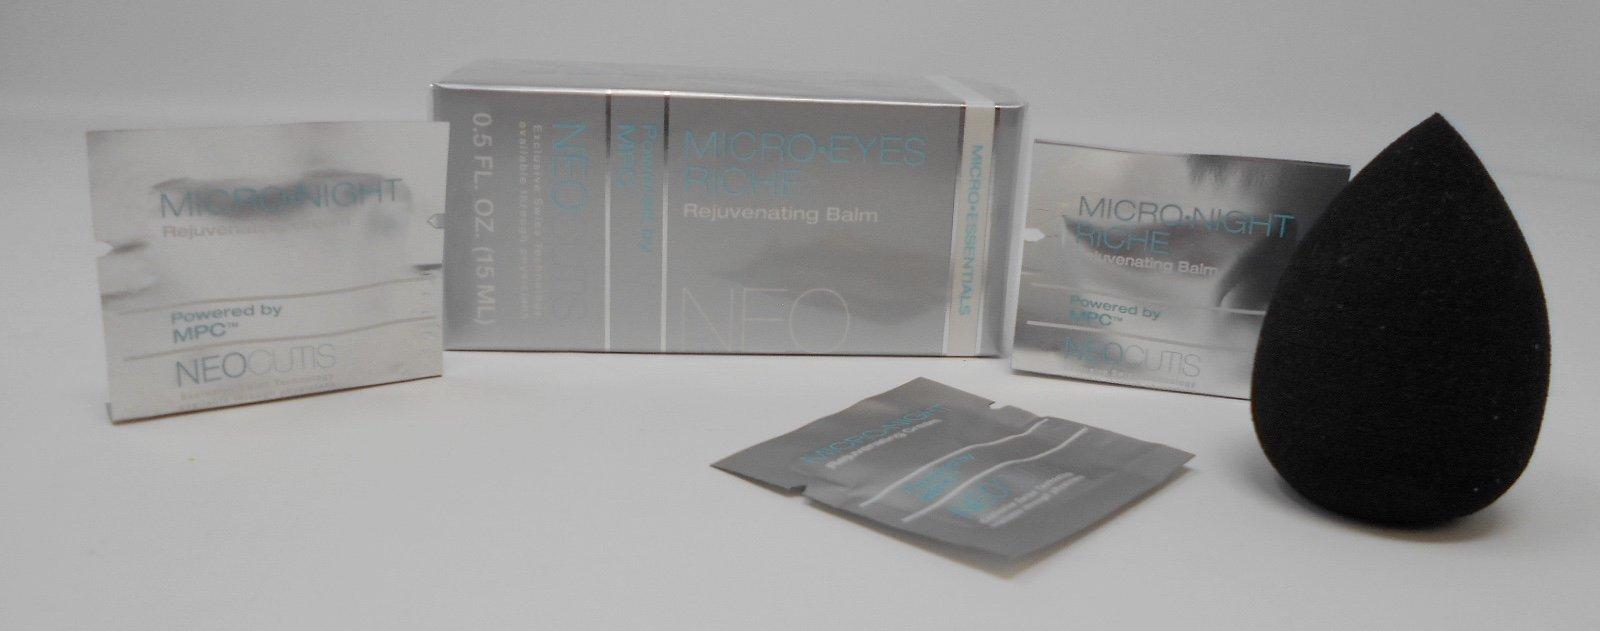 Neocutis Micro Eyes Riche Rejuvenating Balm, 0.5 FL. Oz. Plus Free Cosmetic Blender Sponge and 3 Mixed Samples